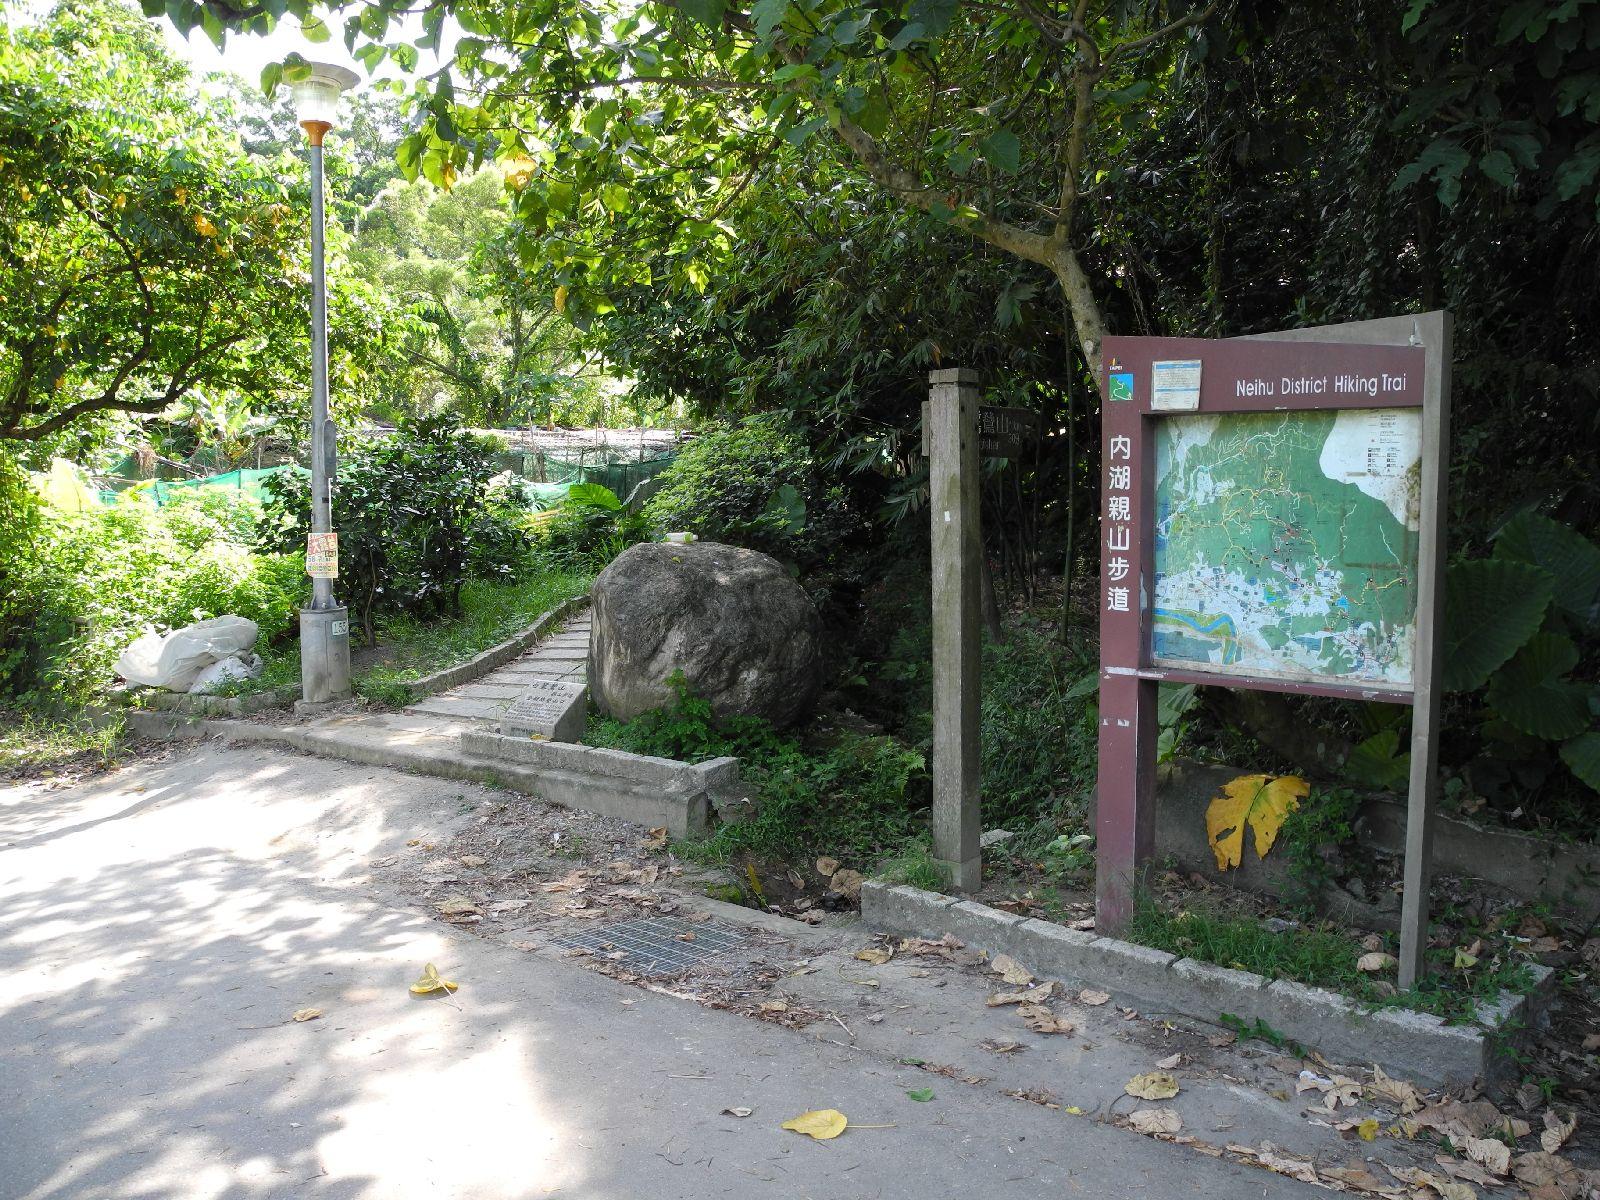 Taipei Hiker: 2012年9月7日 內湖白鷺鷥山-康樂山-明舉山 臺北親山步道を歩く